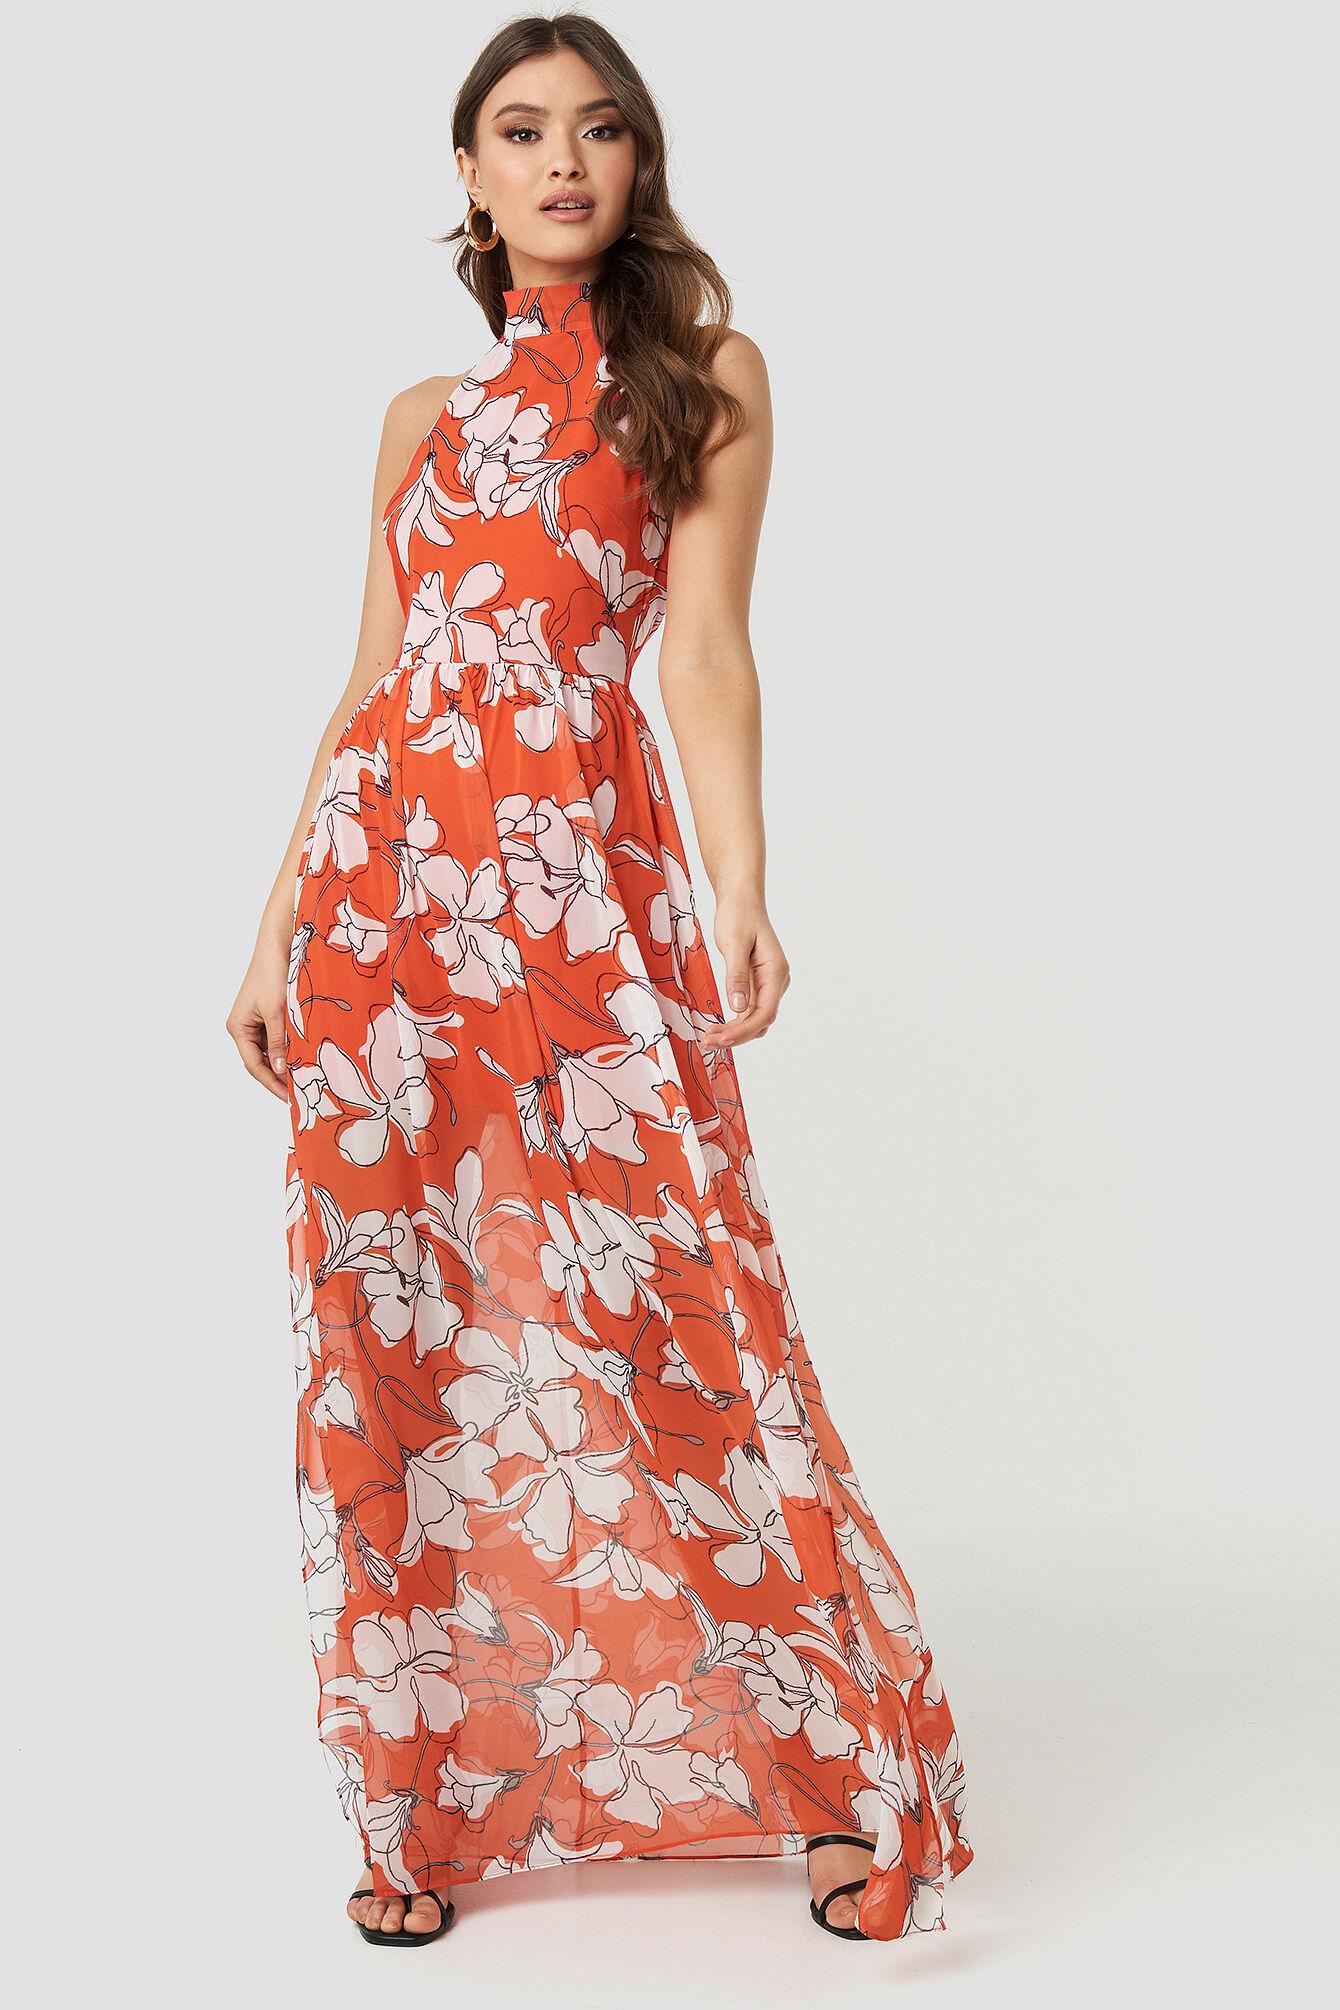 Image of Trendyol Flower Patterned Long Dress - Multicolor